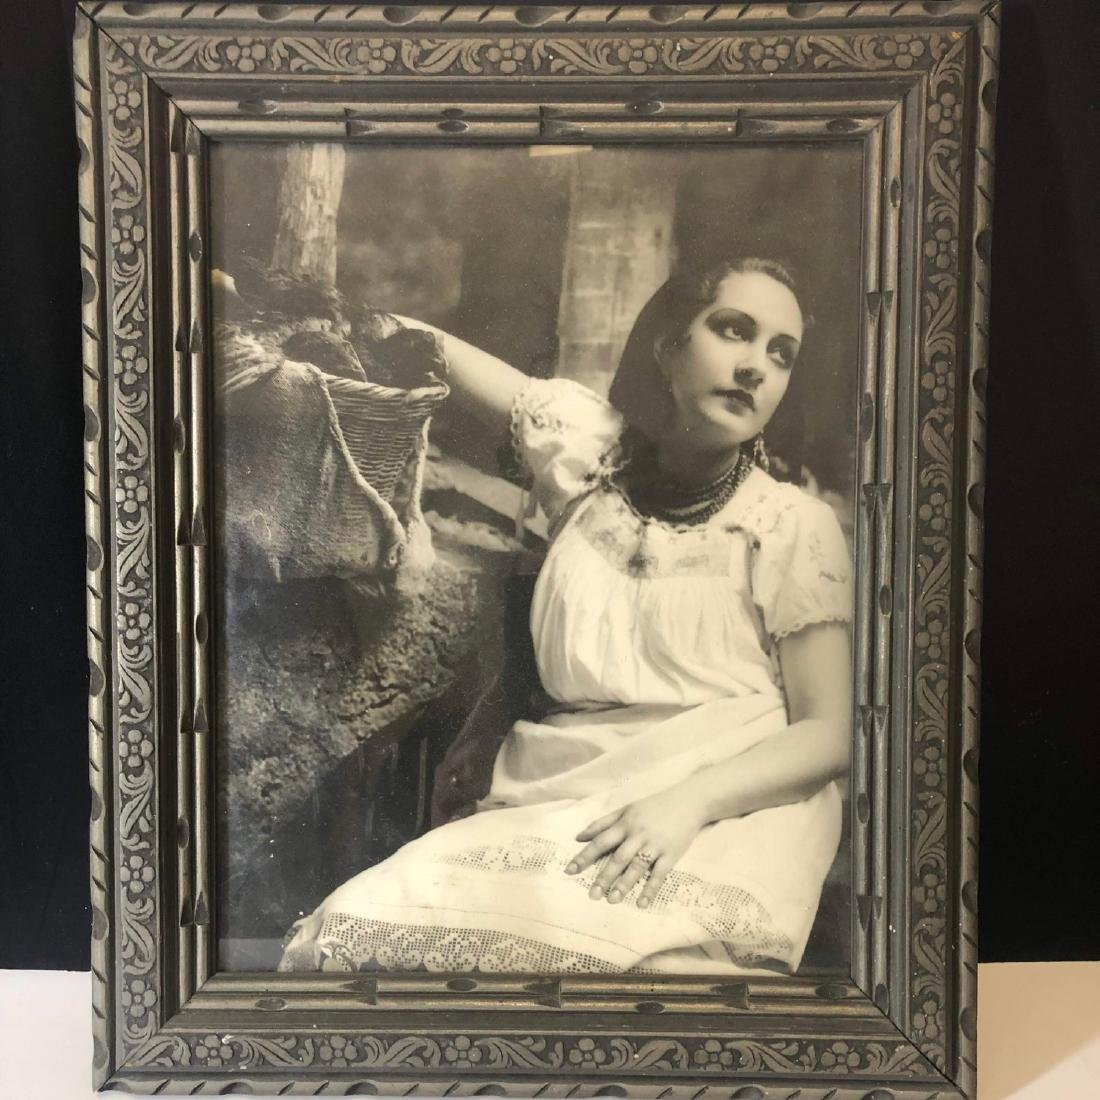 Vintage 1930 art deco photo frame